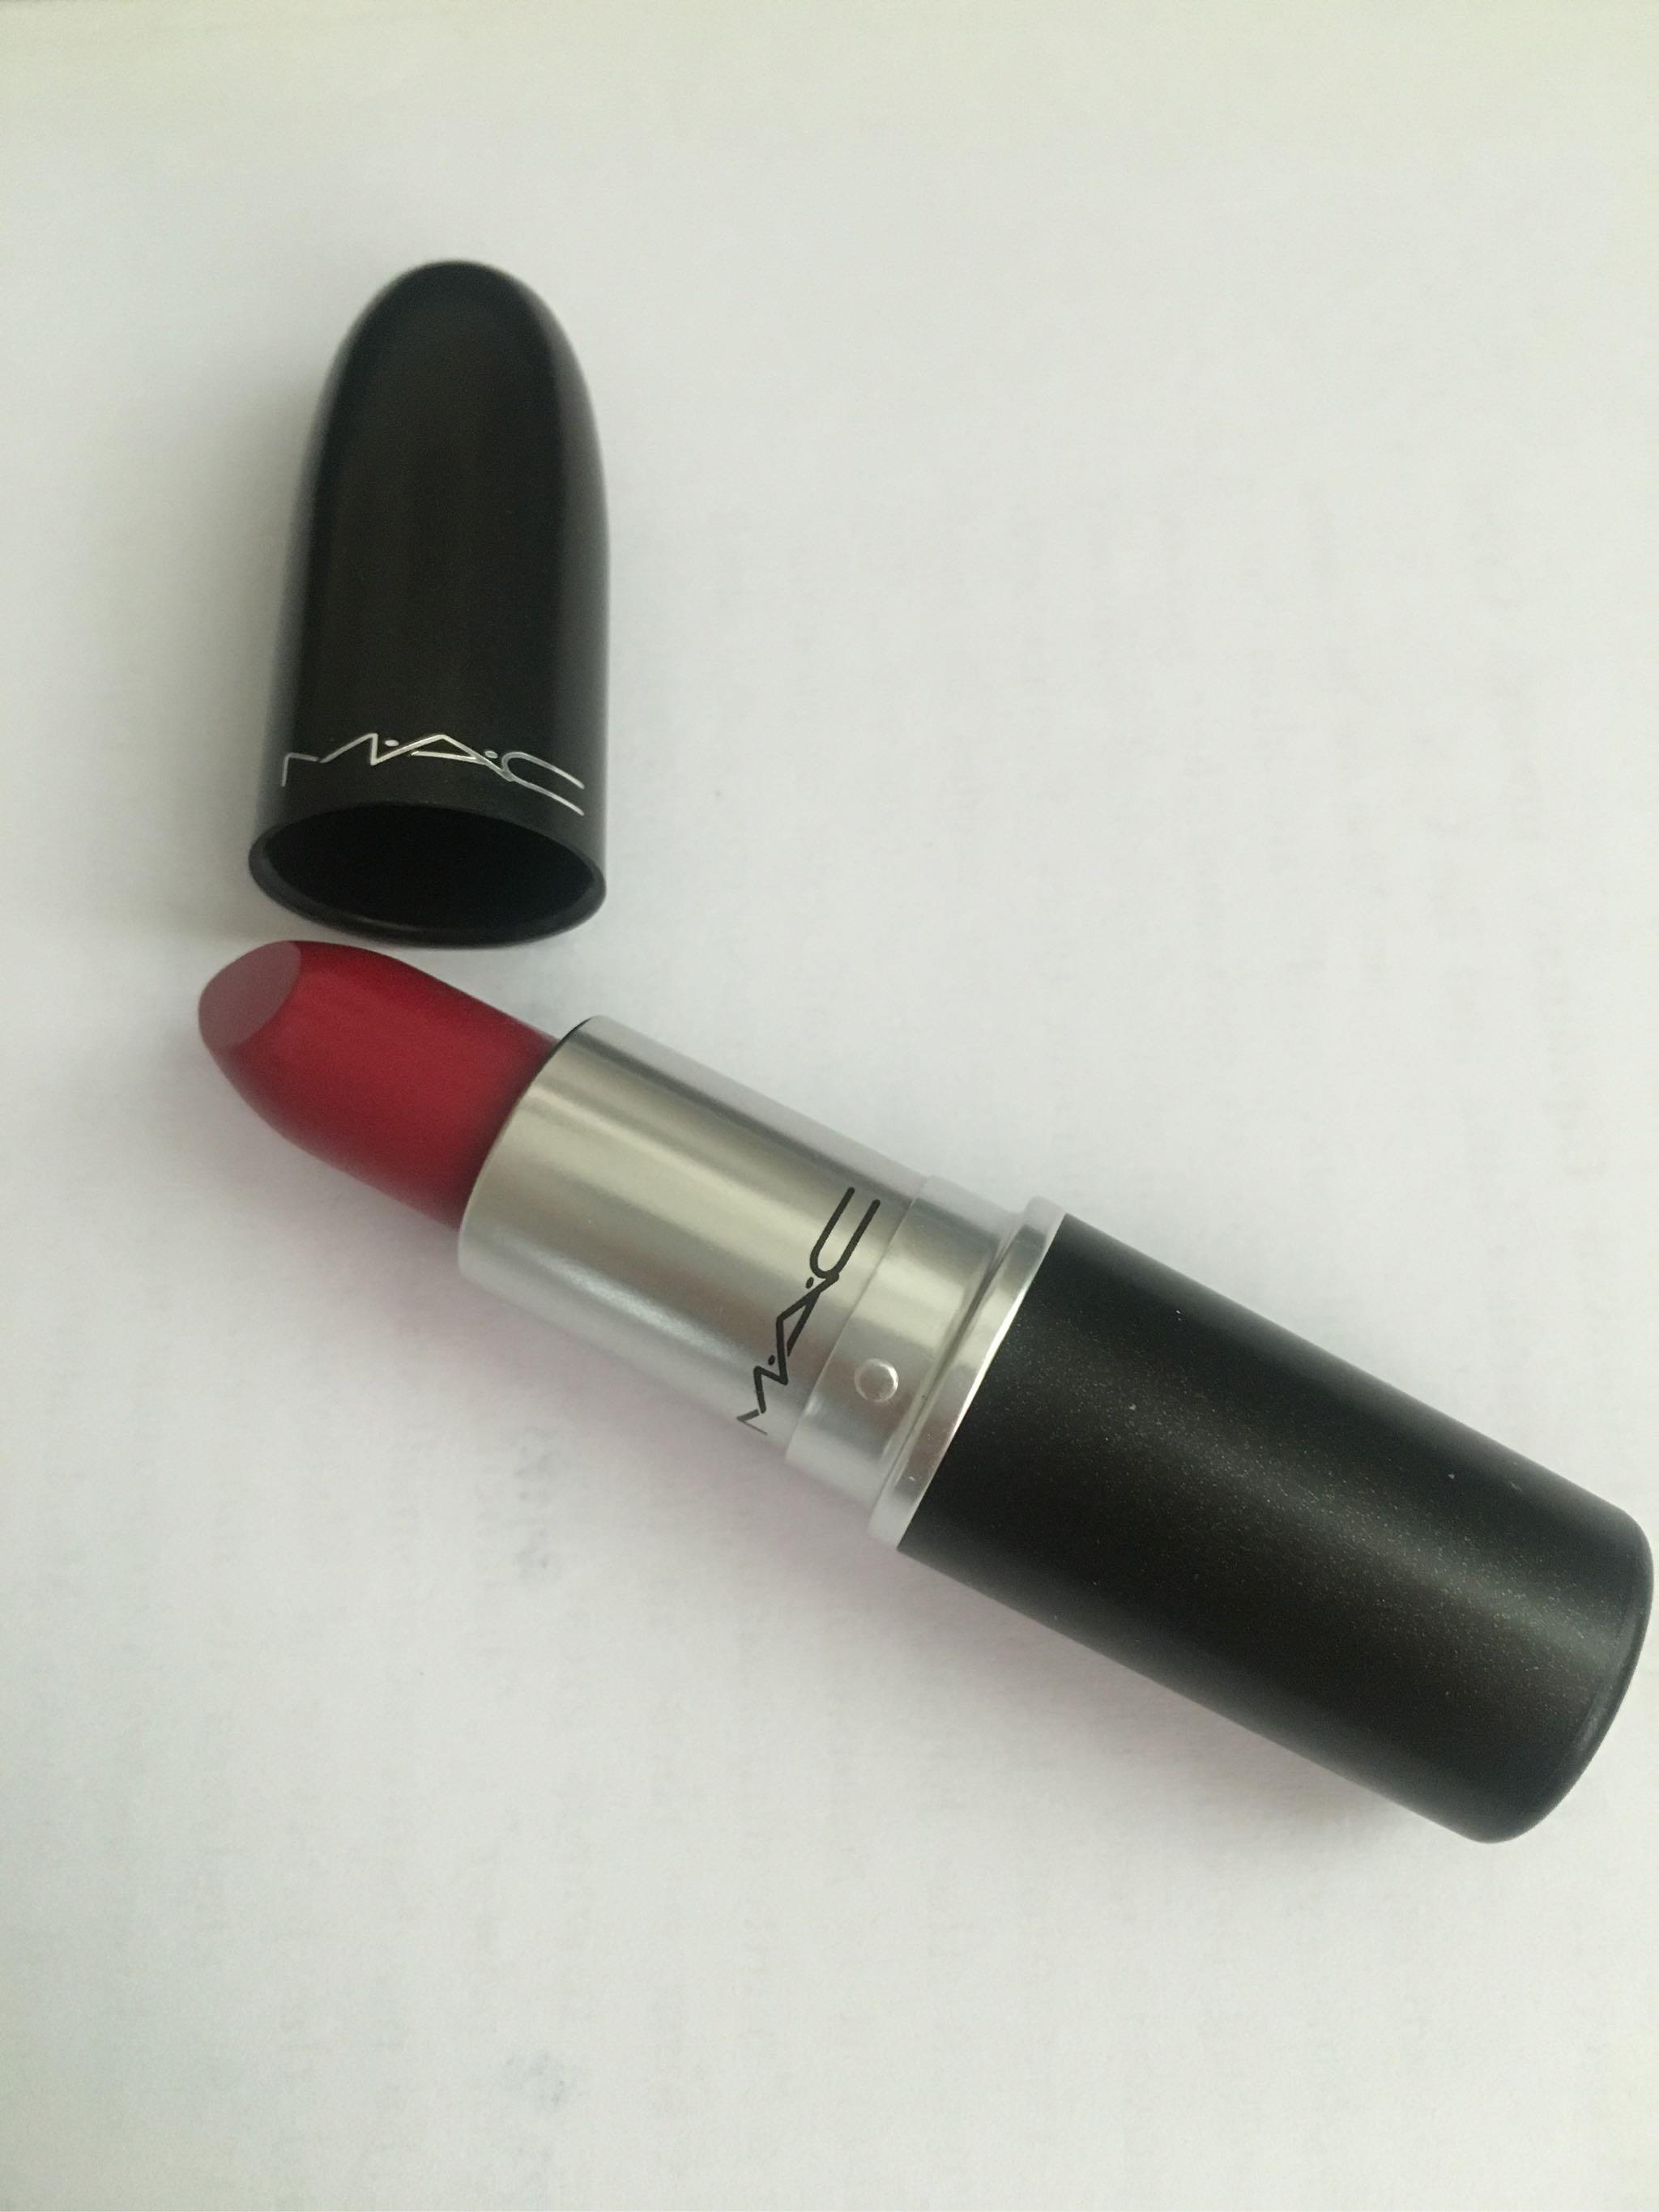 Mac子弹头lady bug BA7口红试色——偏水红色的番茄红,黄皮适合